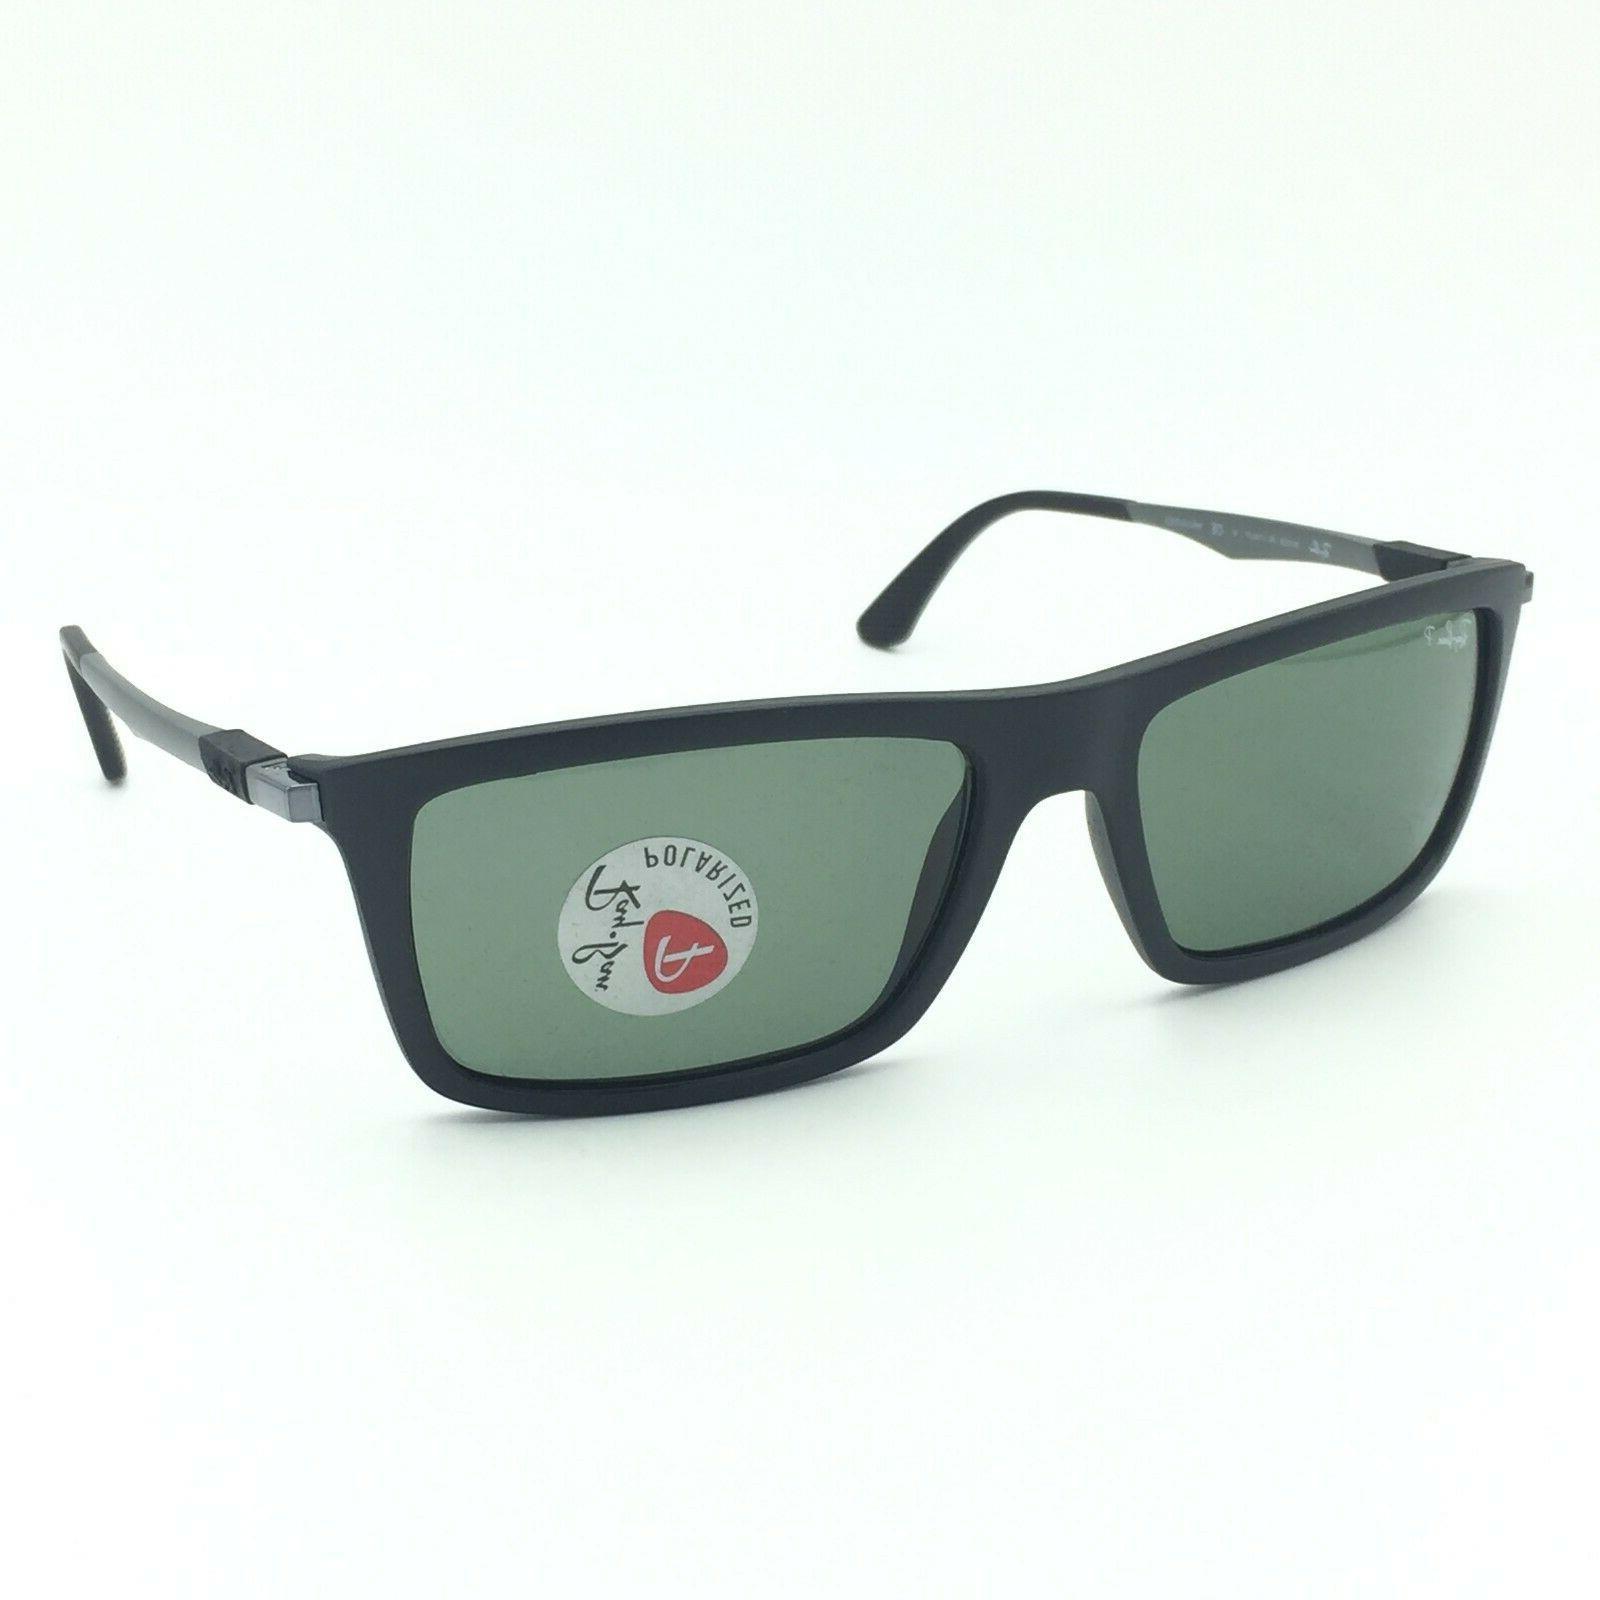 Ray-Ban Sunglasses, RB4214 59